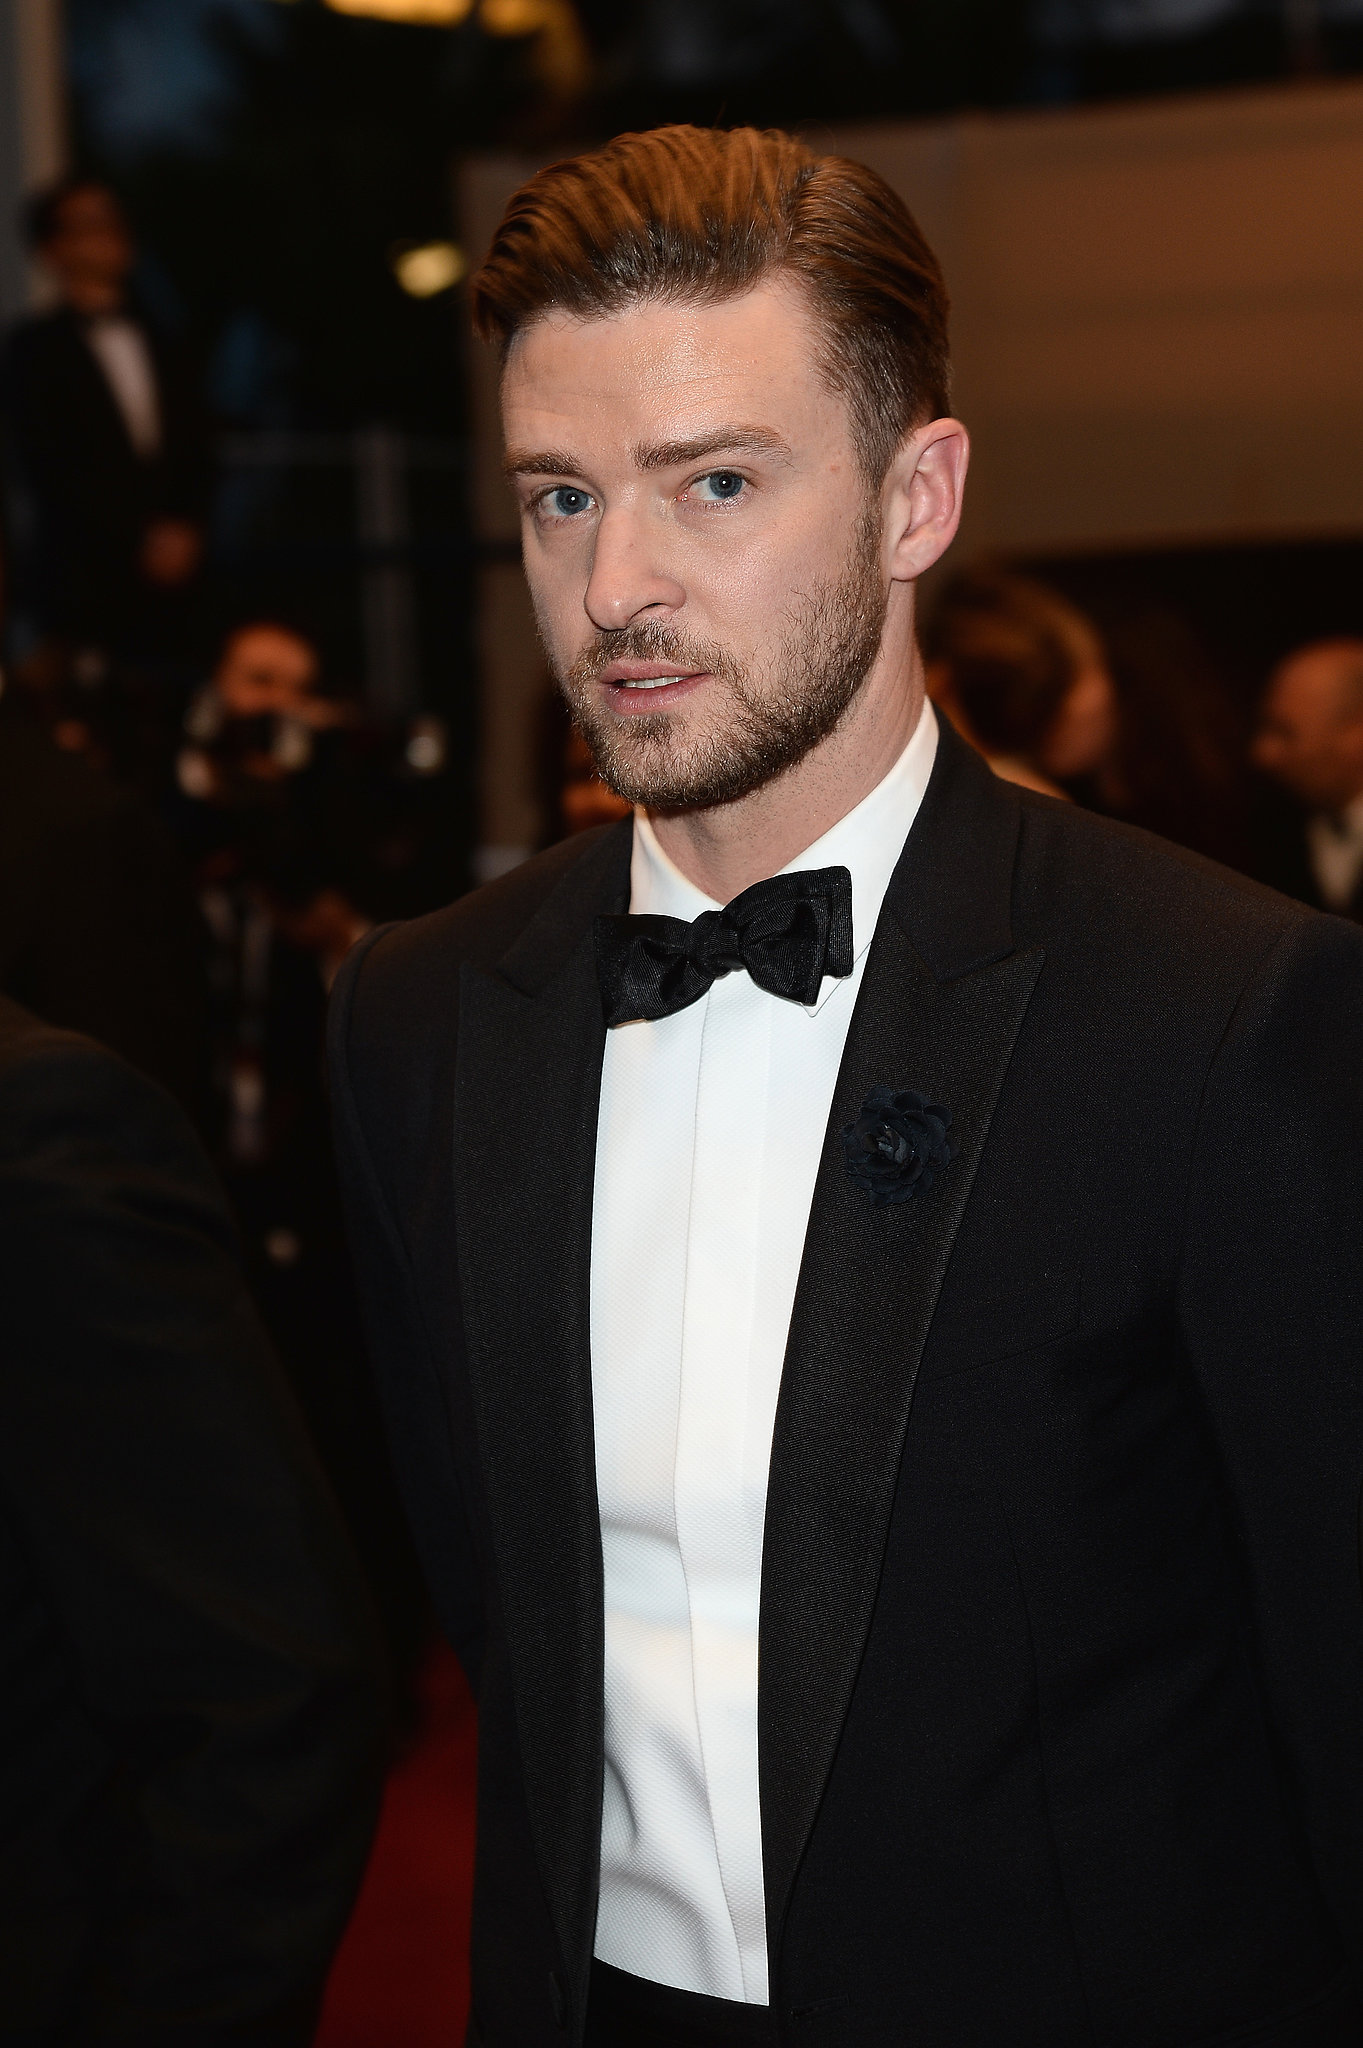 Justin Timberlake Juggles Leading Ladies at His Big Cannes Premiere